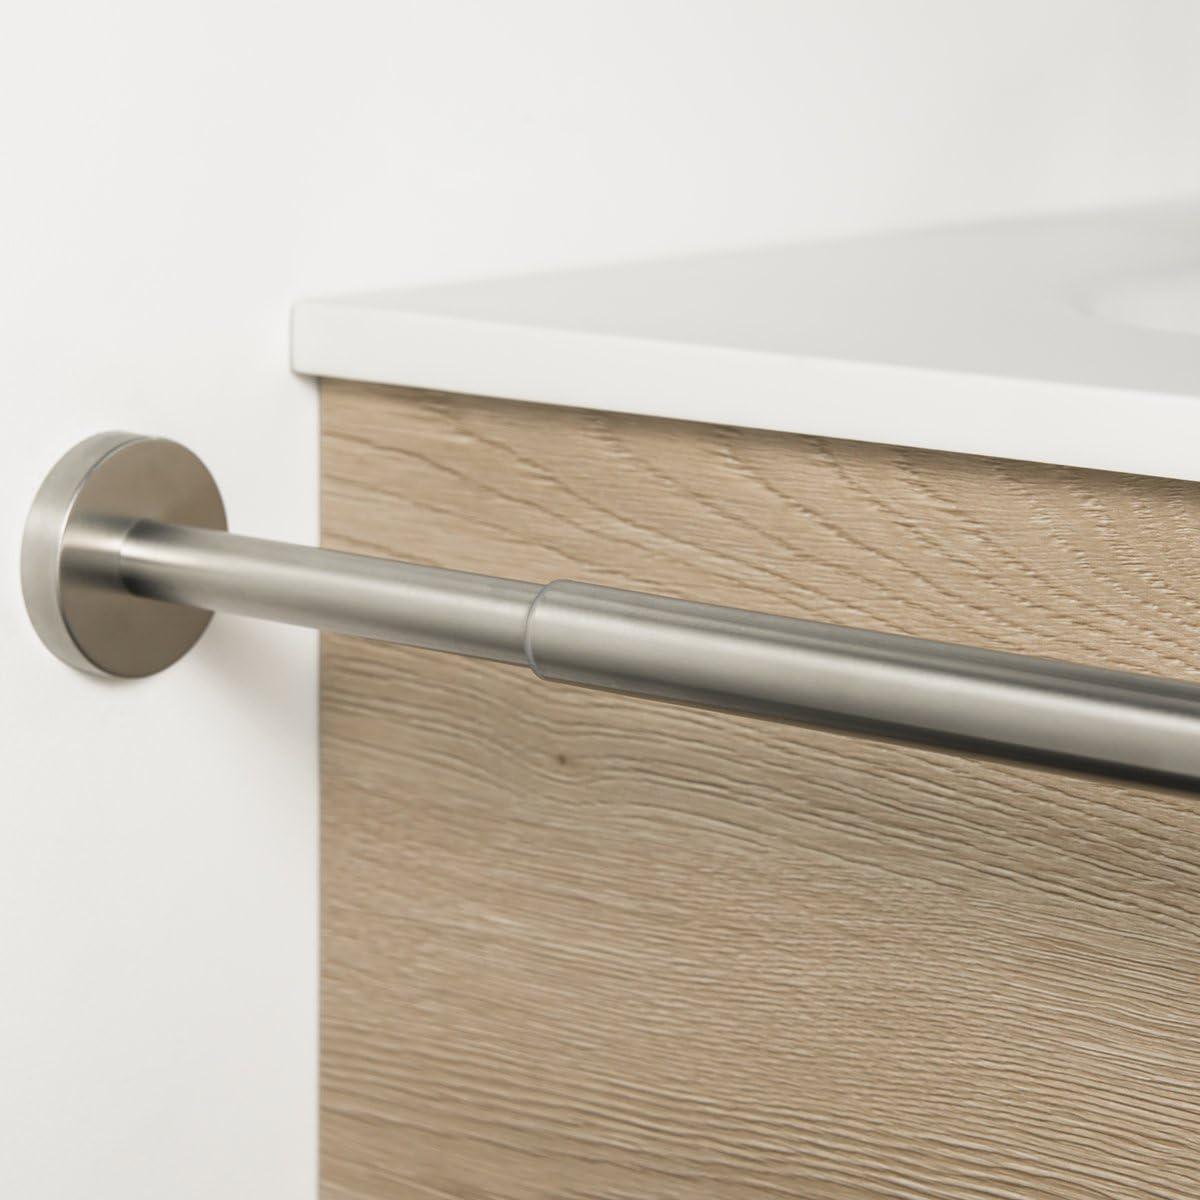 Stainless Steel Matt Bremer Man Bathroom Series Piazza Telescopic Towel Holder 2 arms